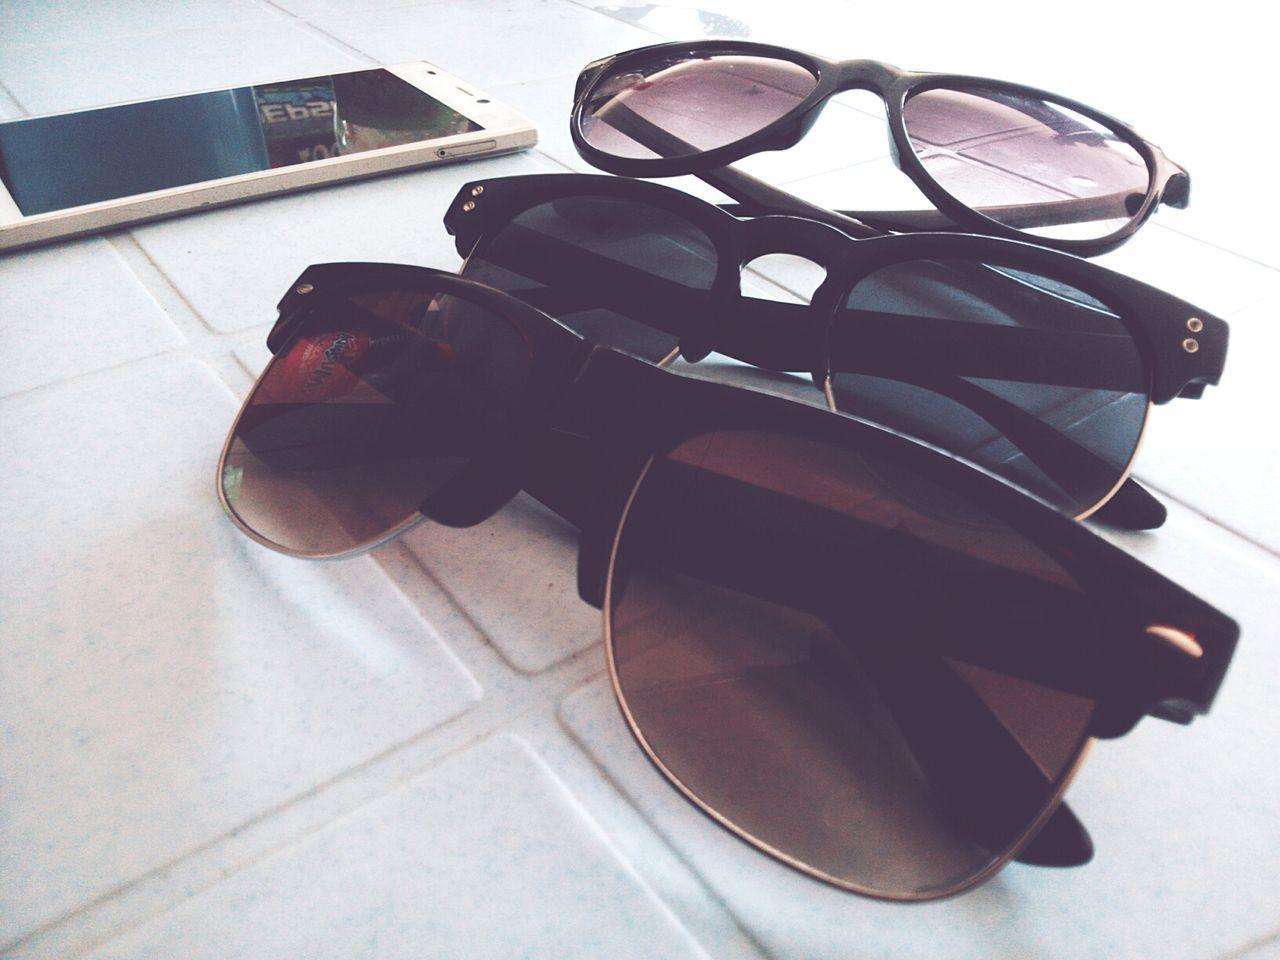 sunglasses, eyeglasses, still life, eyewear, table, no people, high angle view, eyesight, indoors, close-up, day